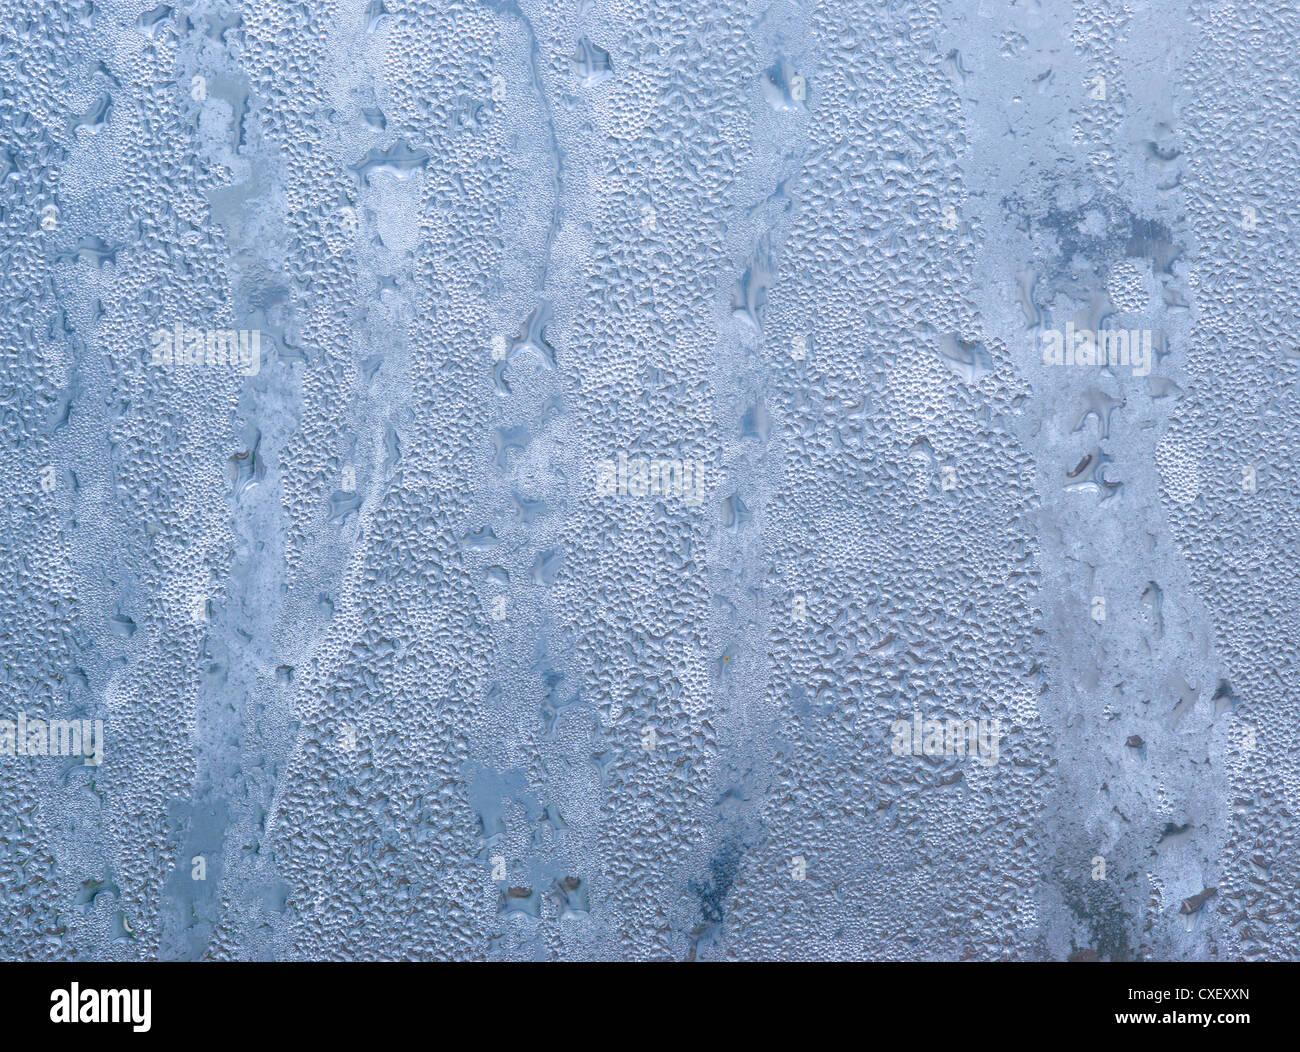 Waterdrop  Close-up - Stock Image